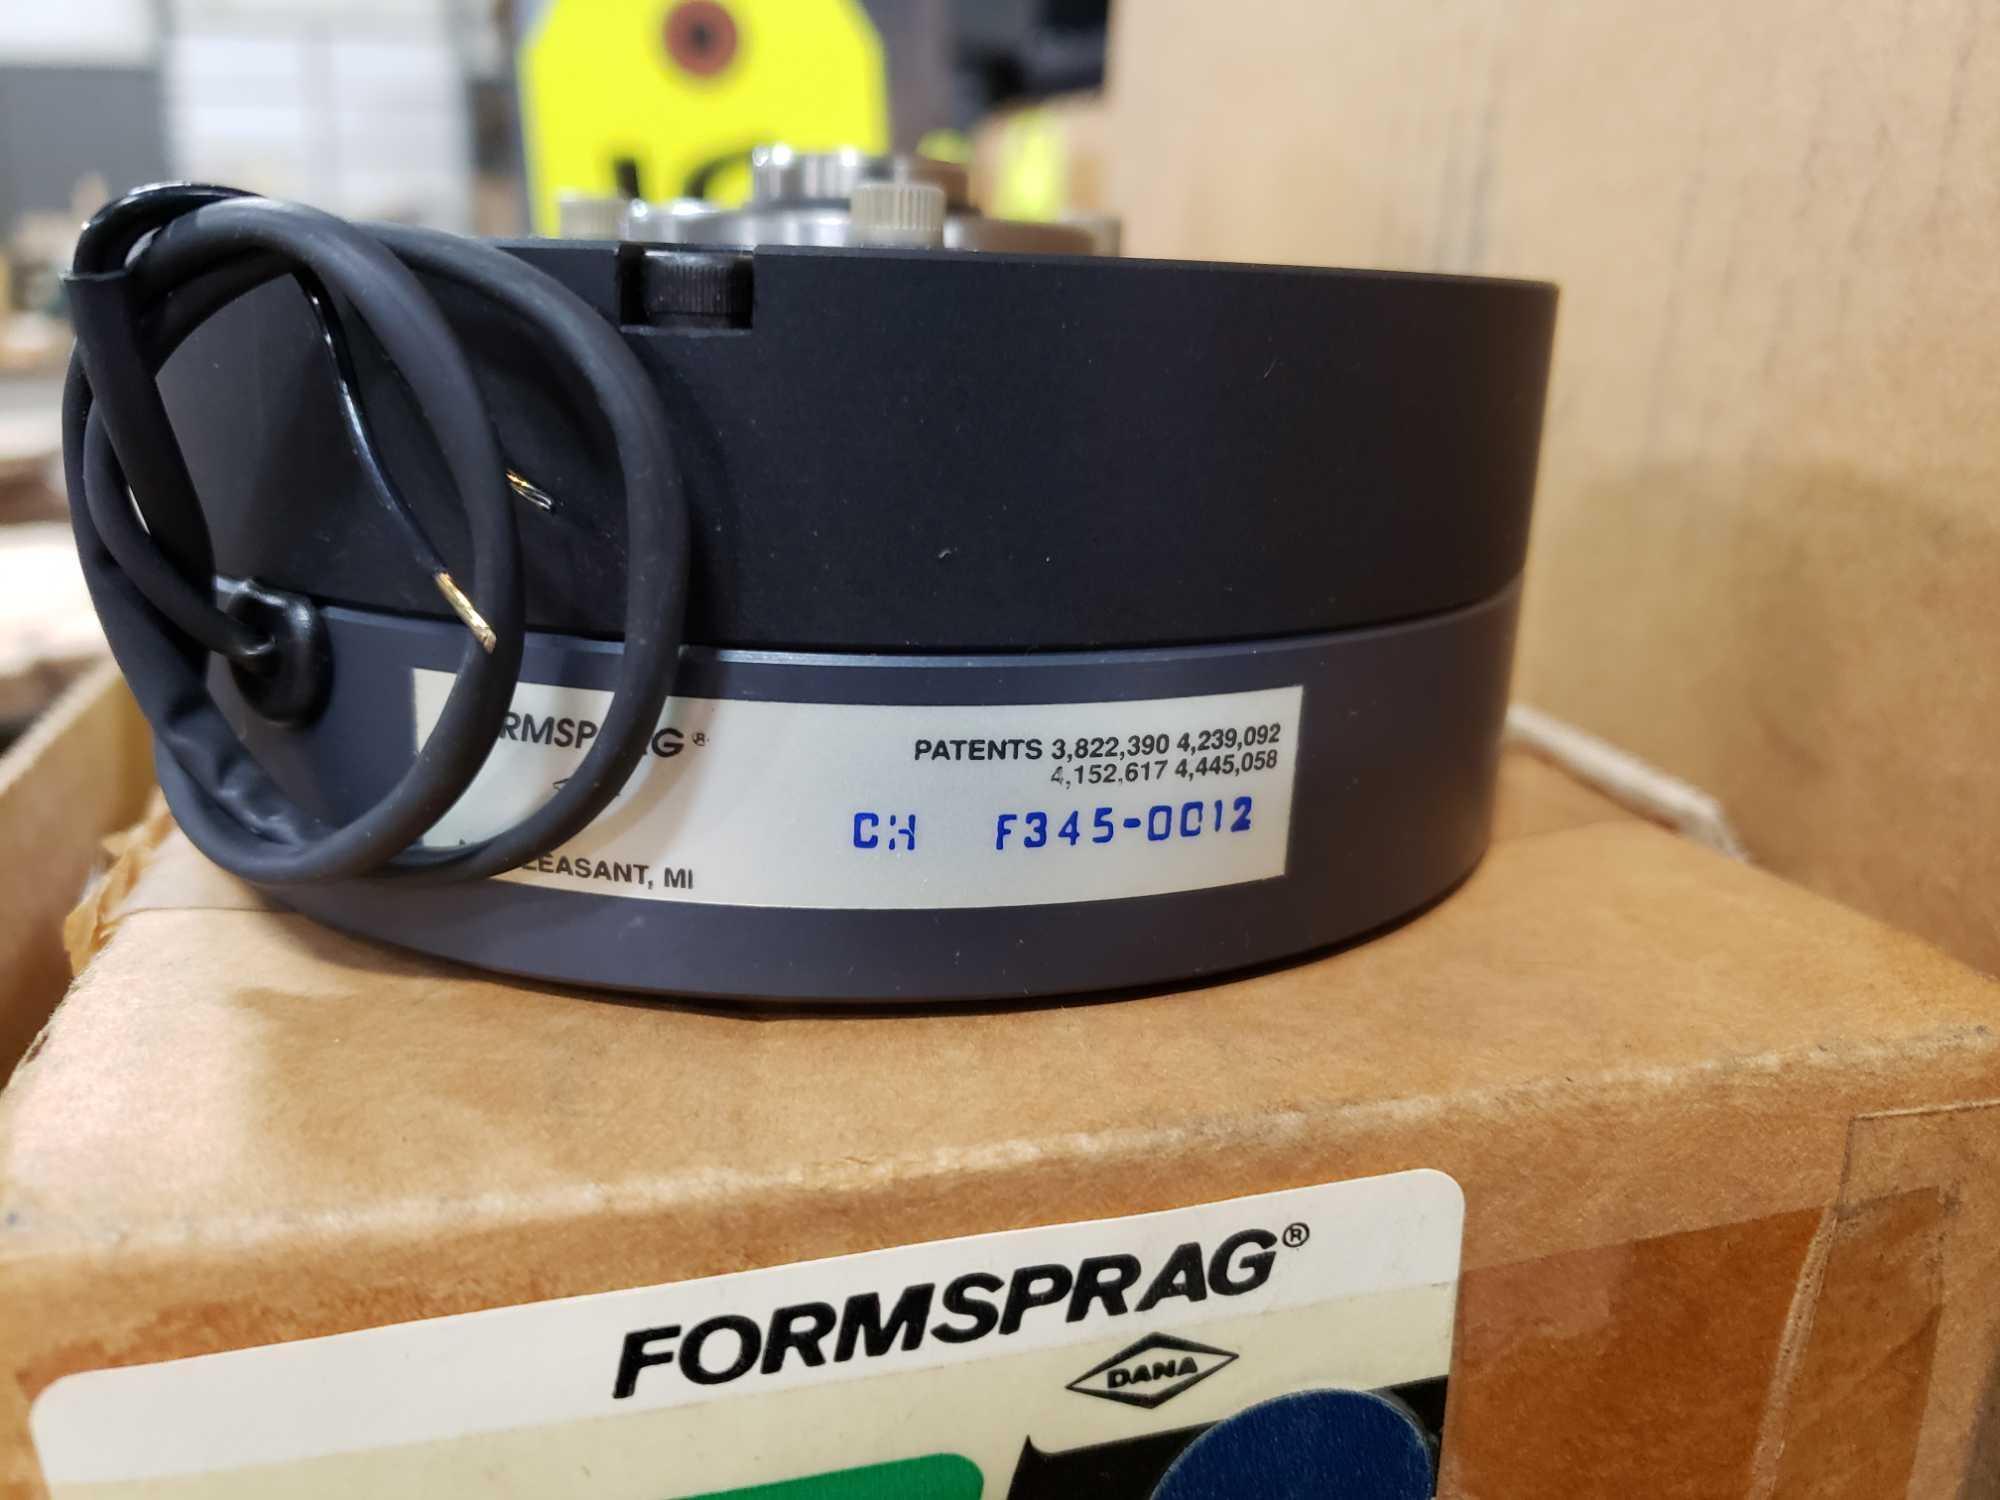 Formsprag Magpowr sofstep model PSB-70/90V magnetic partical clutch brake. New in box. - Image 2 of 3